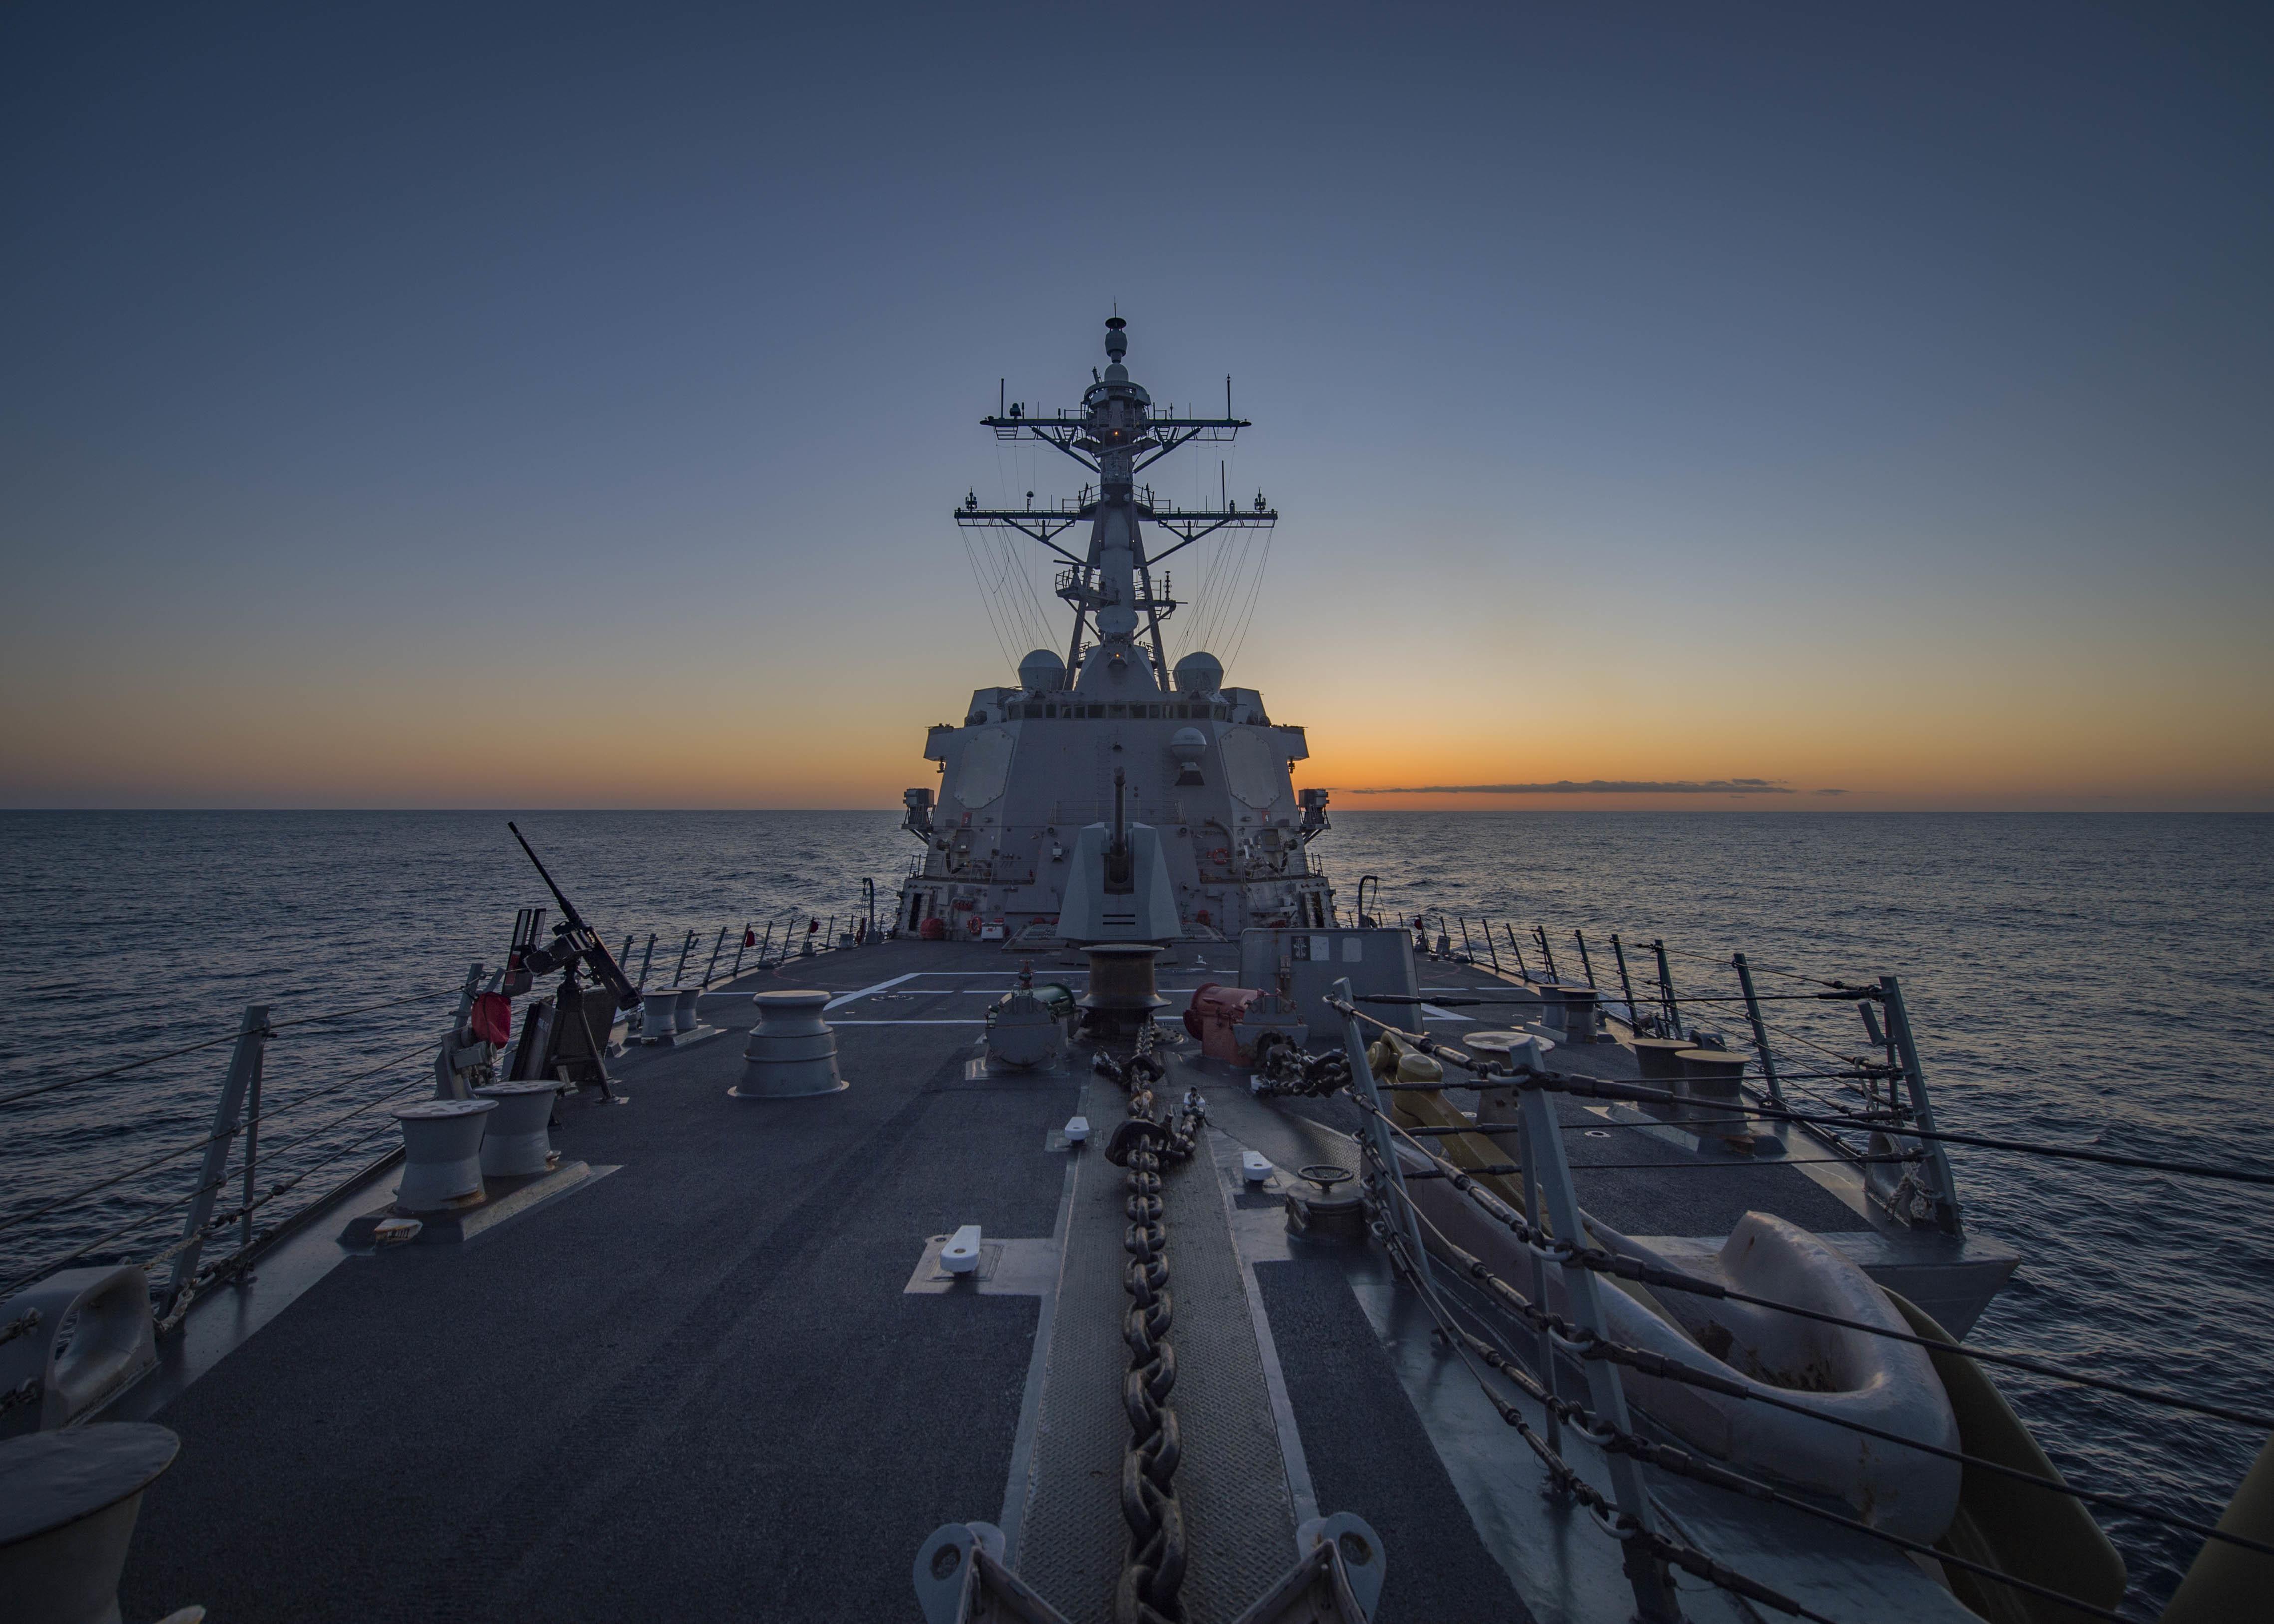 FY 2020 Budget: Navy Cuts Ship, Aircraft Procurement